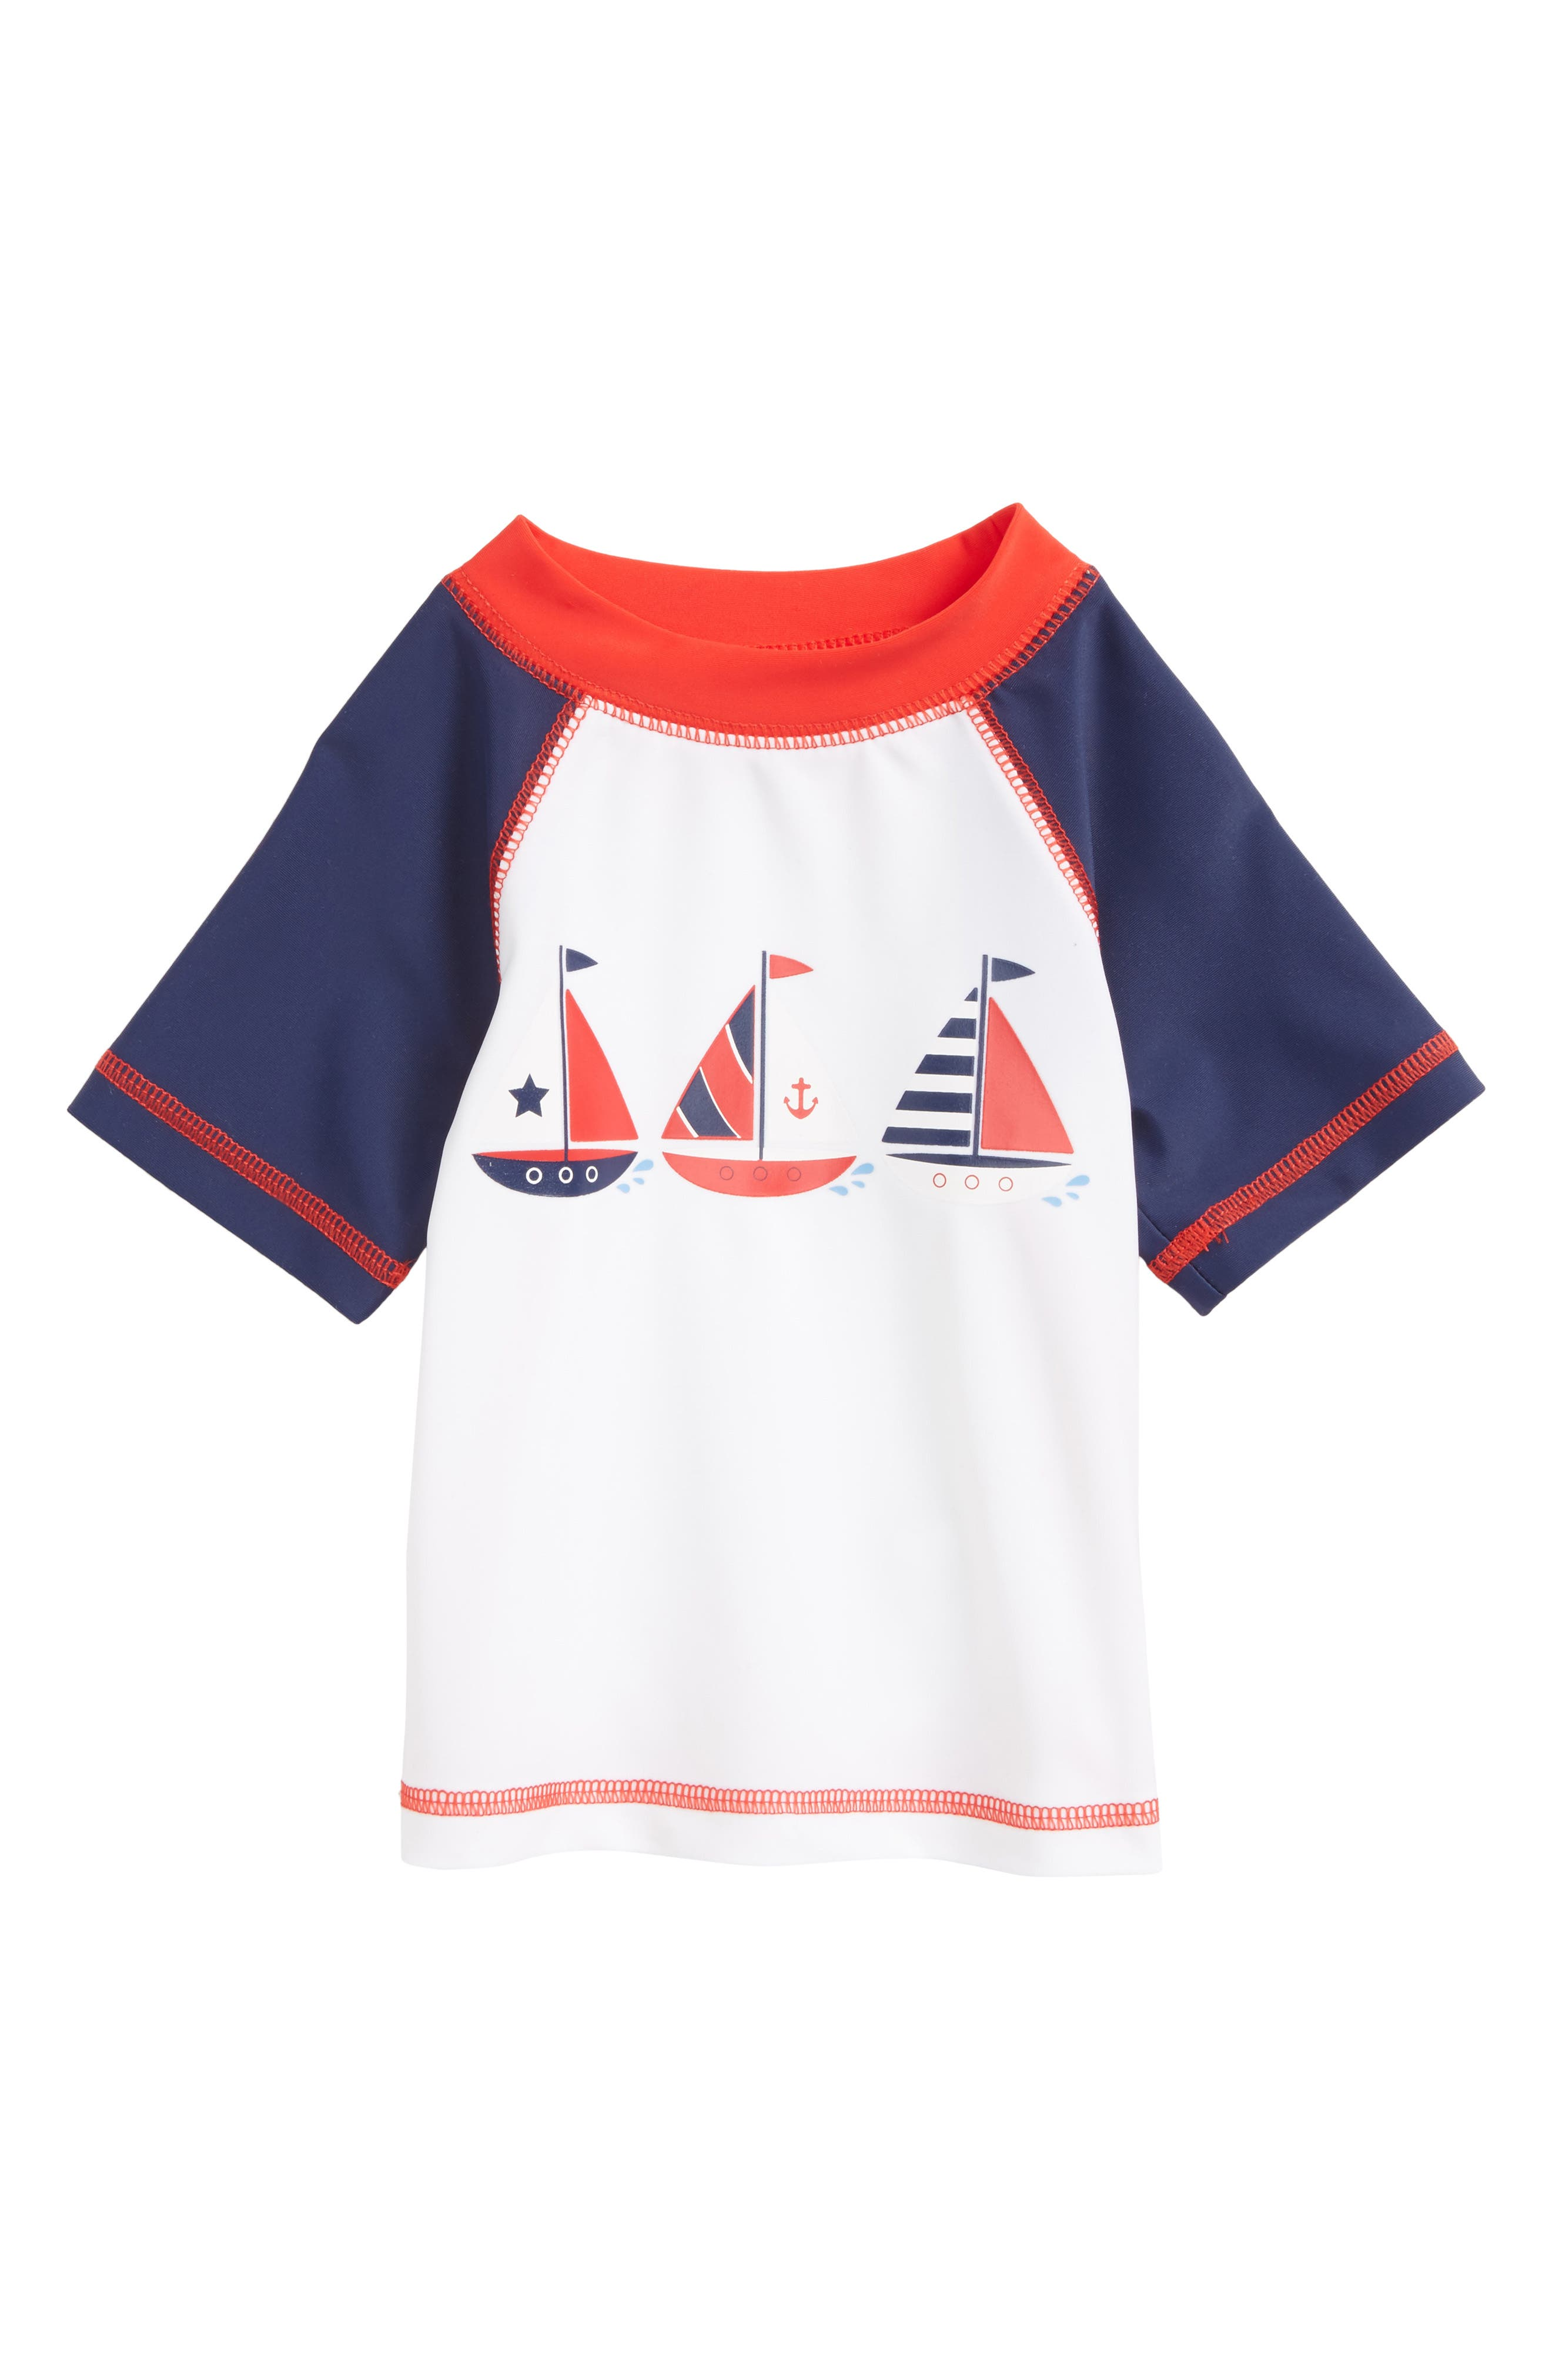 Alternate Image 1 Selected - Little Me Sailboat UPF 50+ Rashguard (Baby Boys)